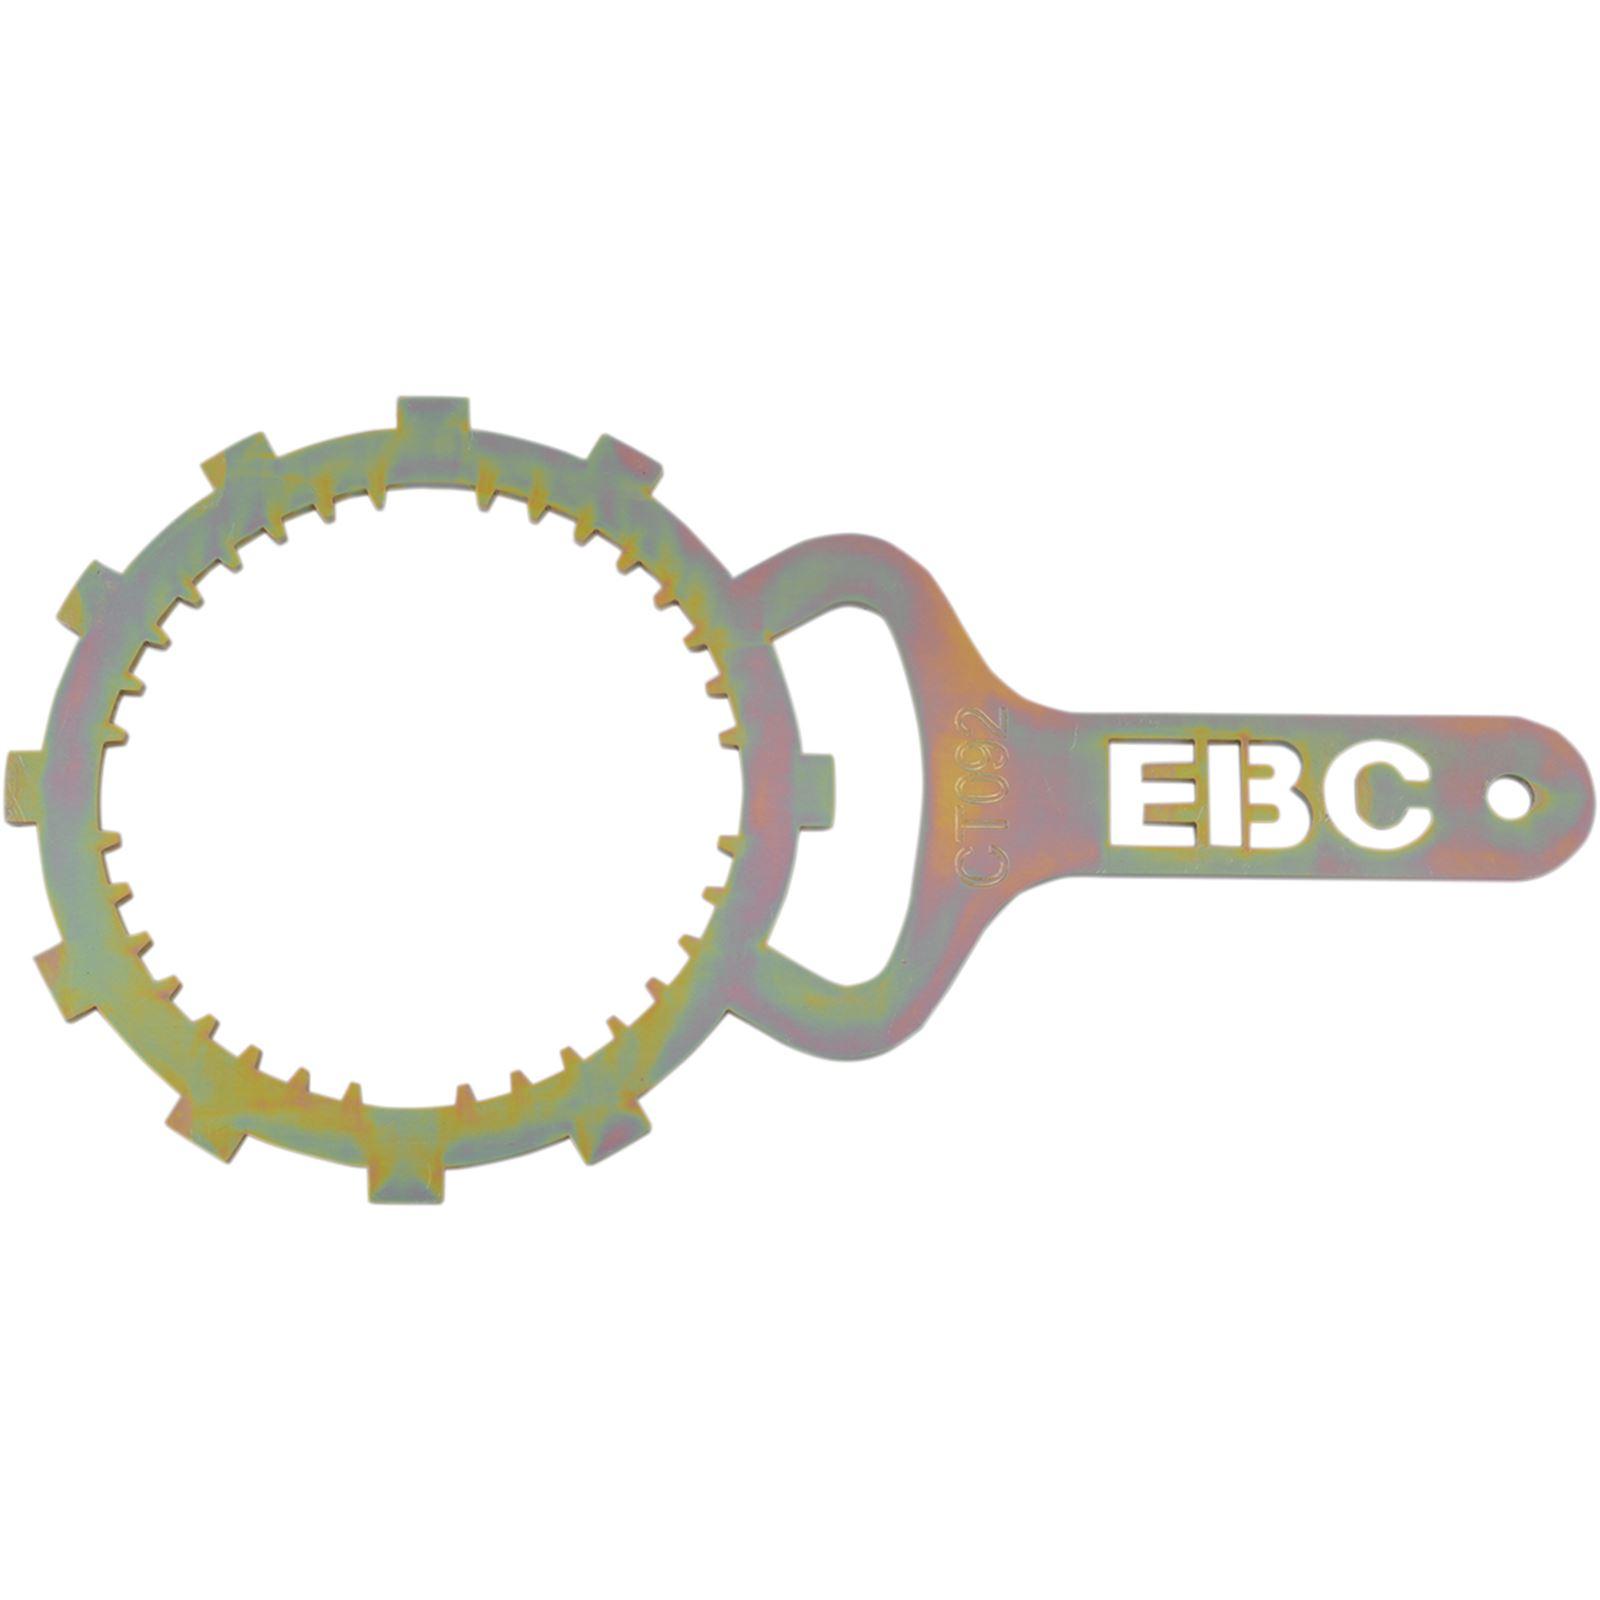 EBC Clutch Tool